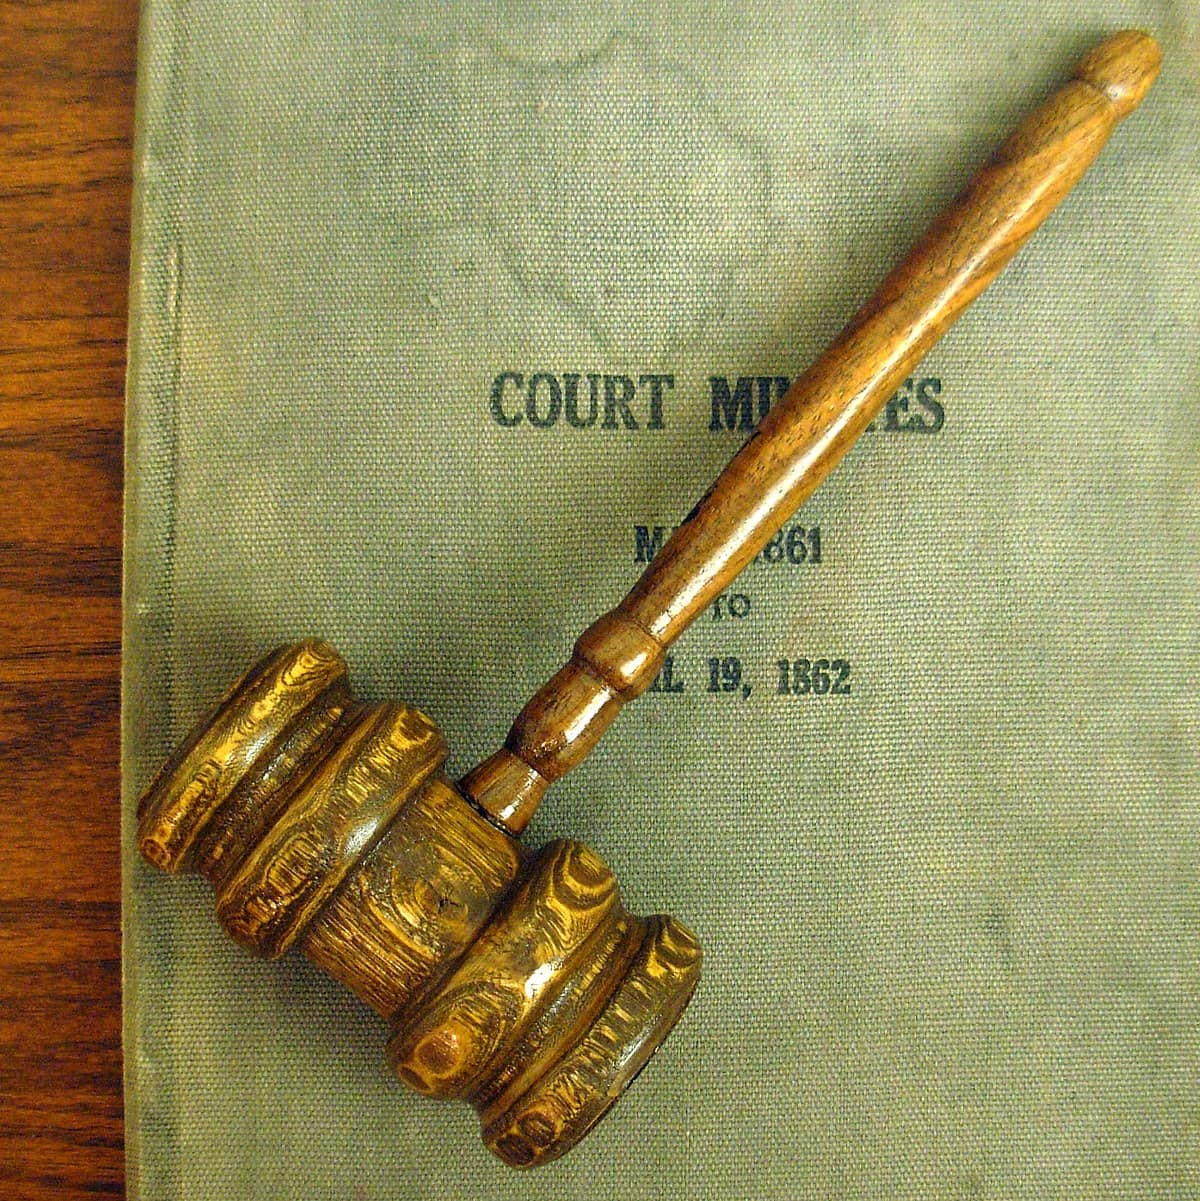 MAJOR JUDGMENTS IN CIVIL JURISPRUDENCE